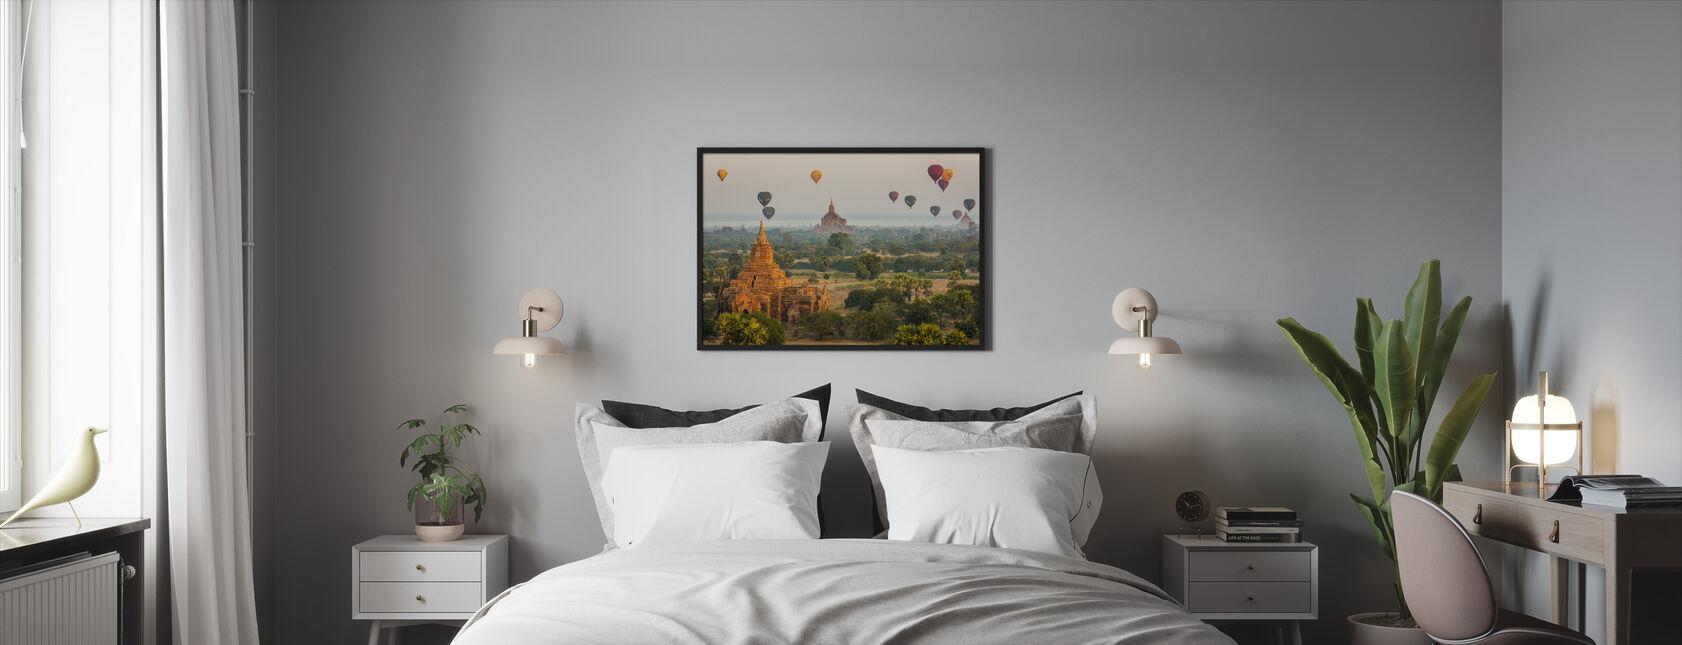 Ballons Bagan - Impression encadree - Chambre